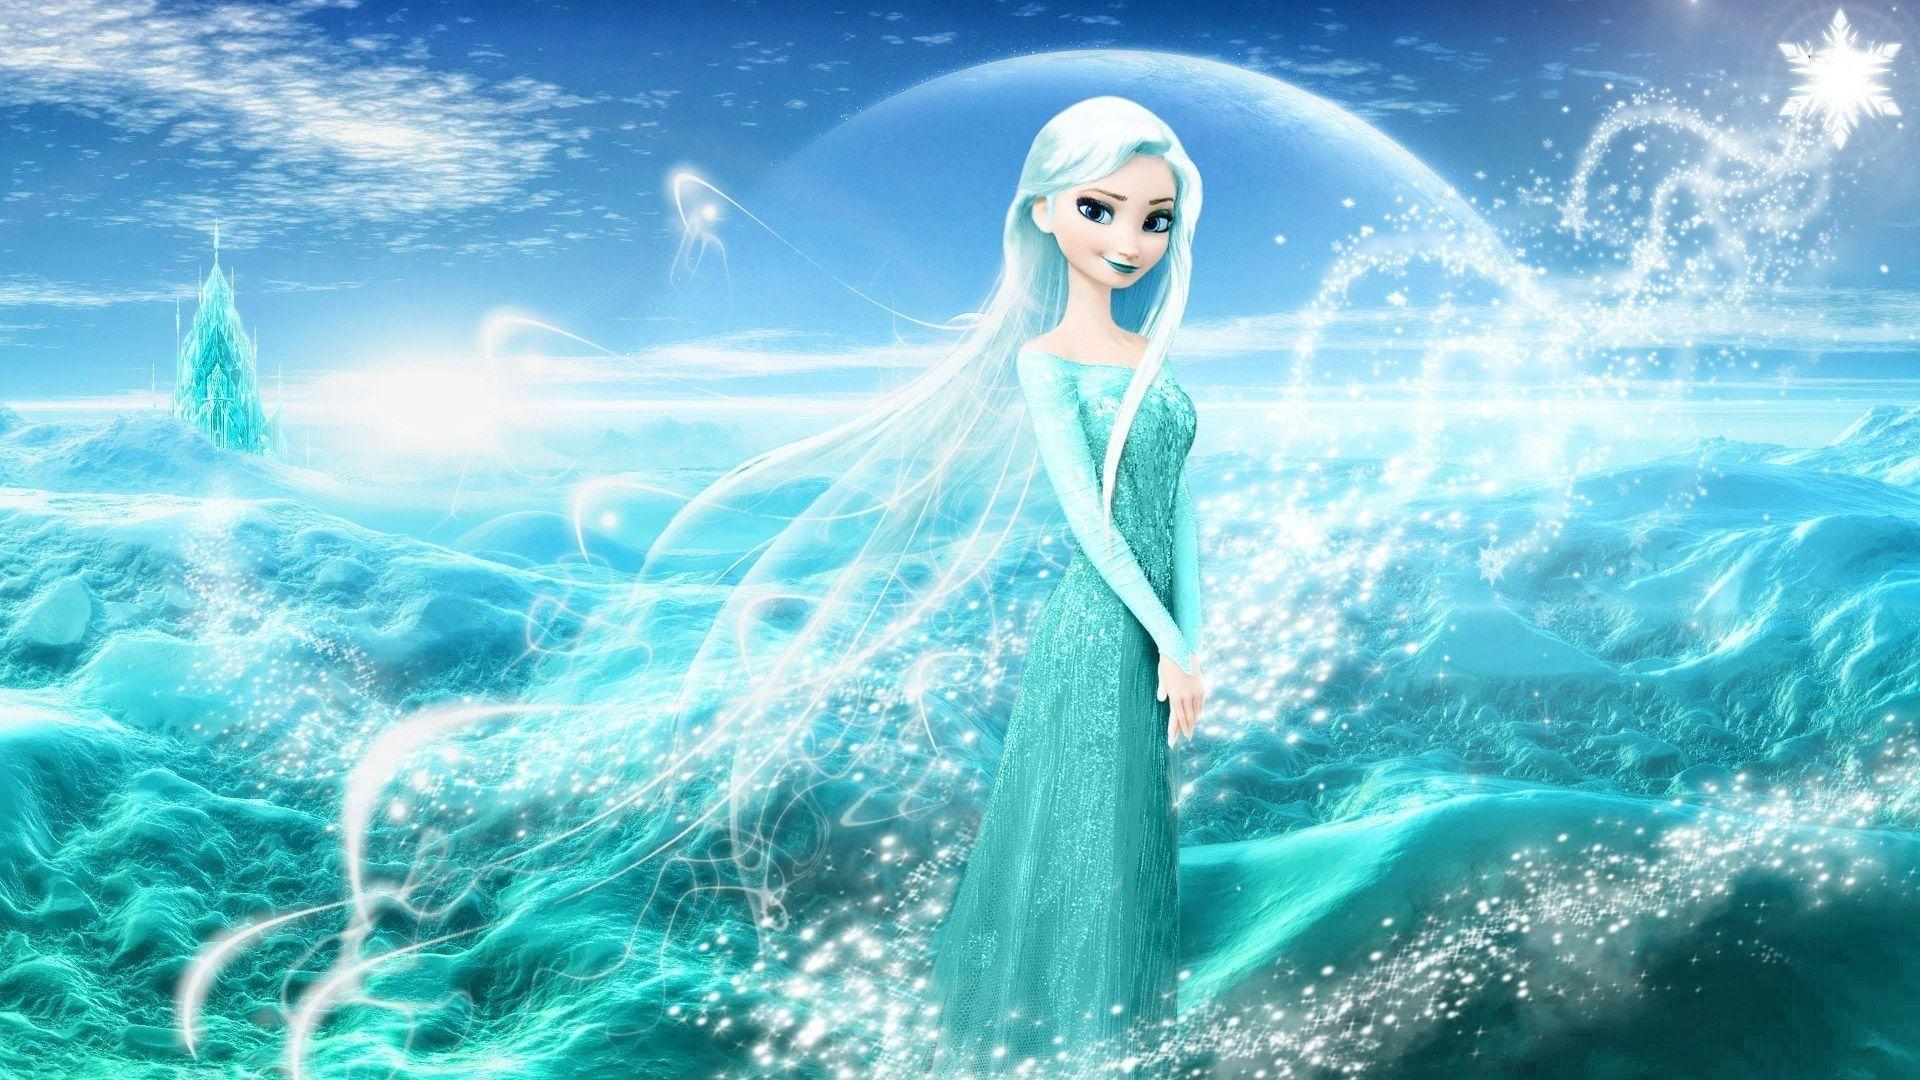 Elsa Frozen Two Wallpapers Top Free Elsa Frozen Two Backgrounds Wallpaperaccess